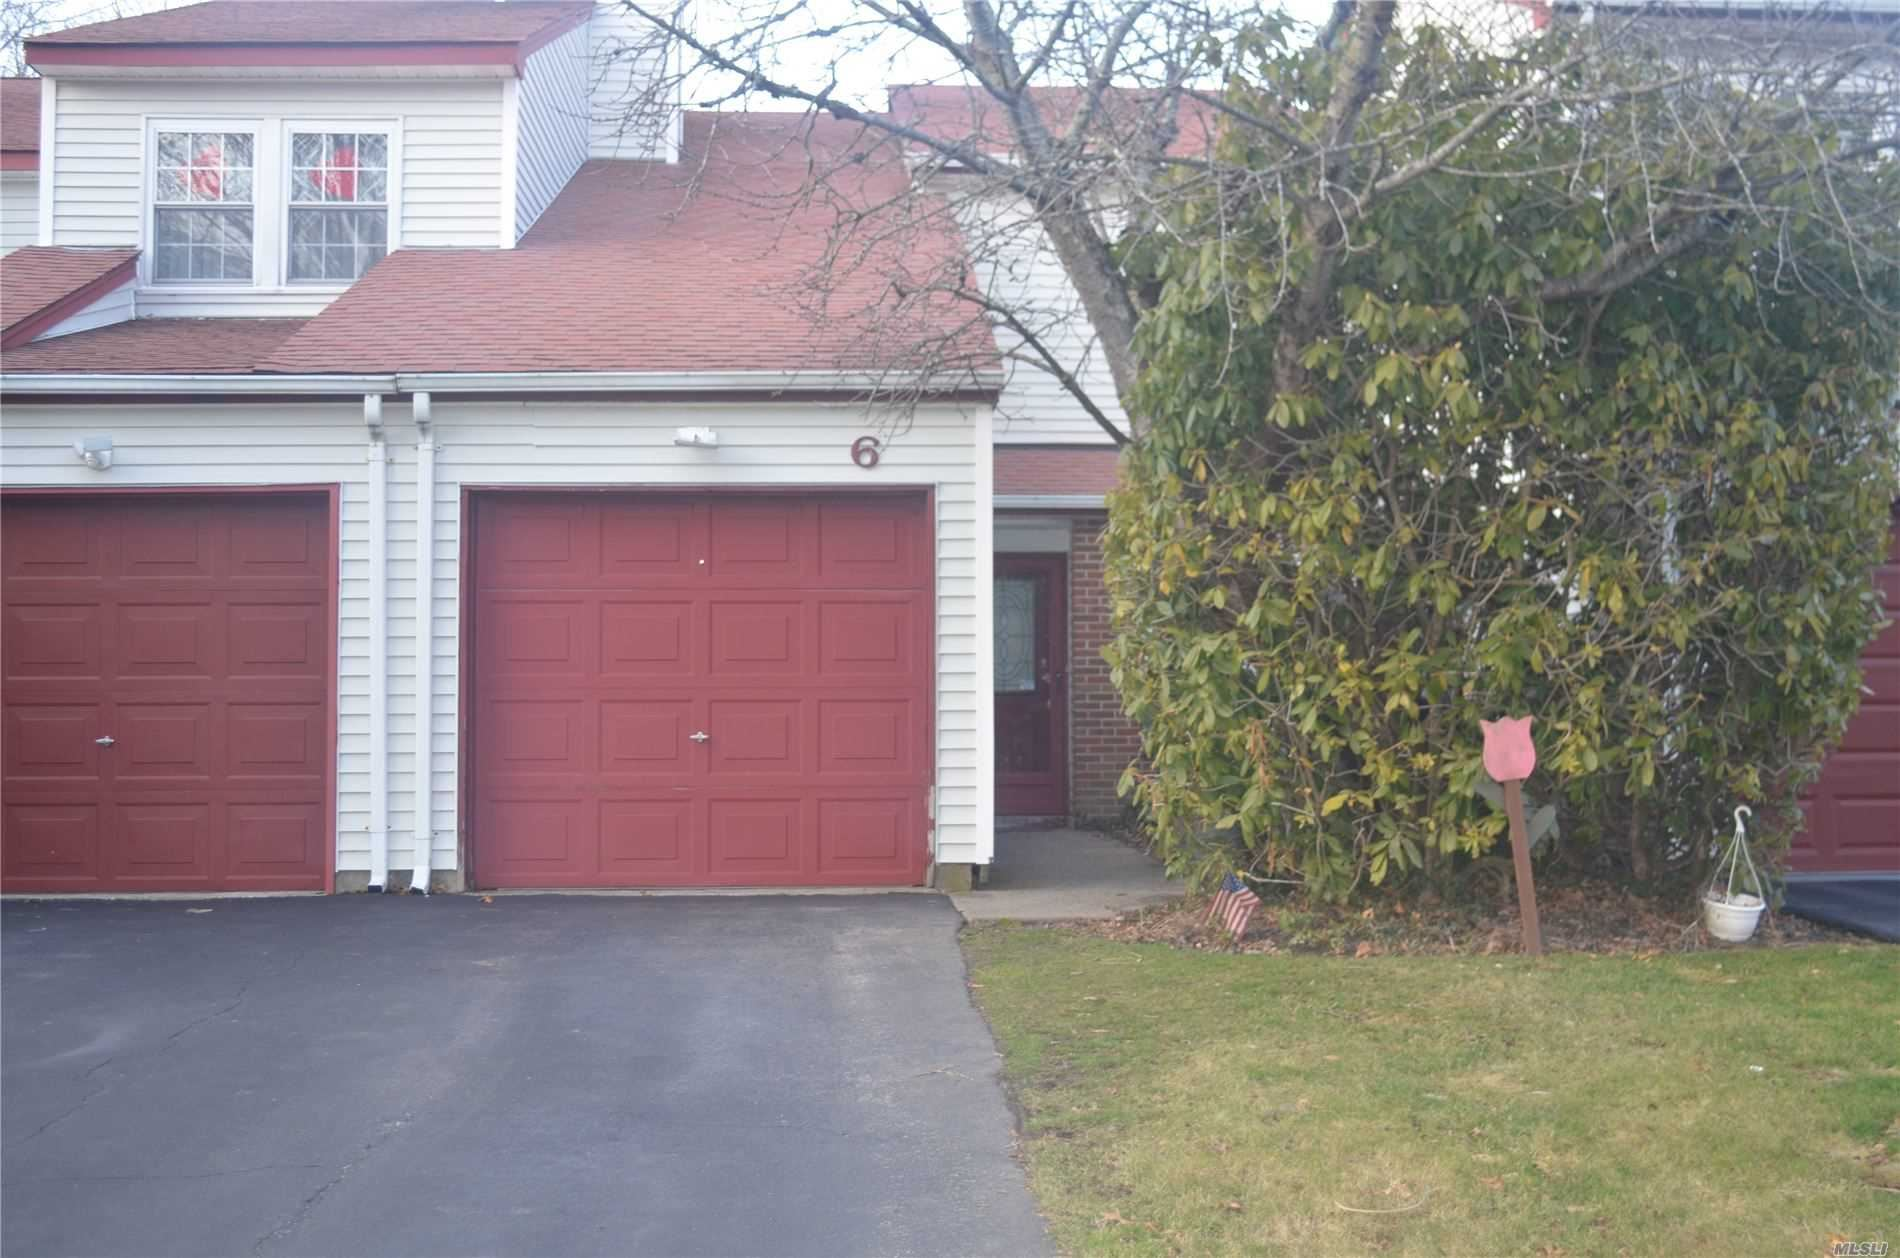 6 Farragut Court, Coram, NY 11727 - MLS#: 3201753